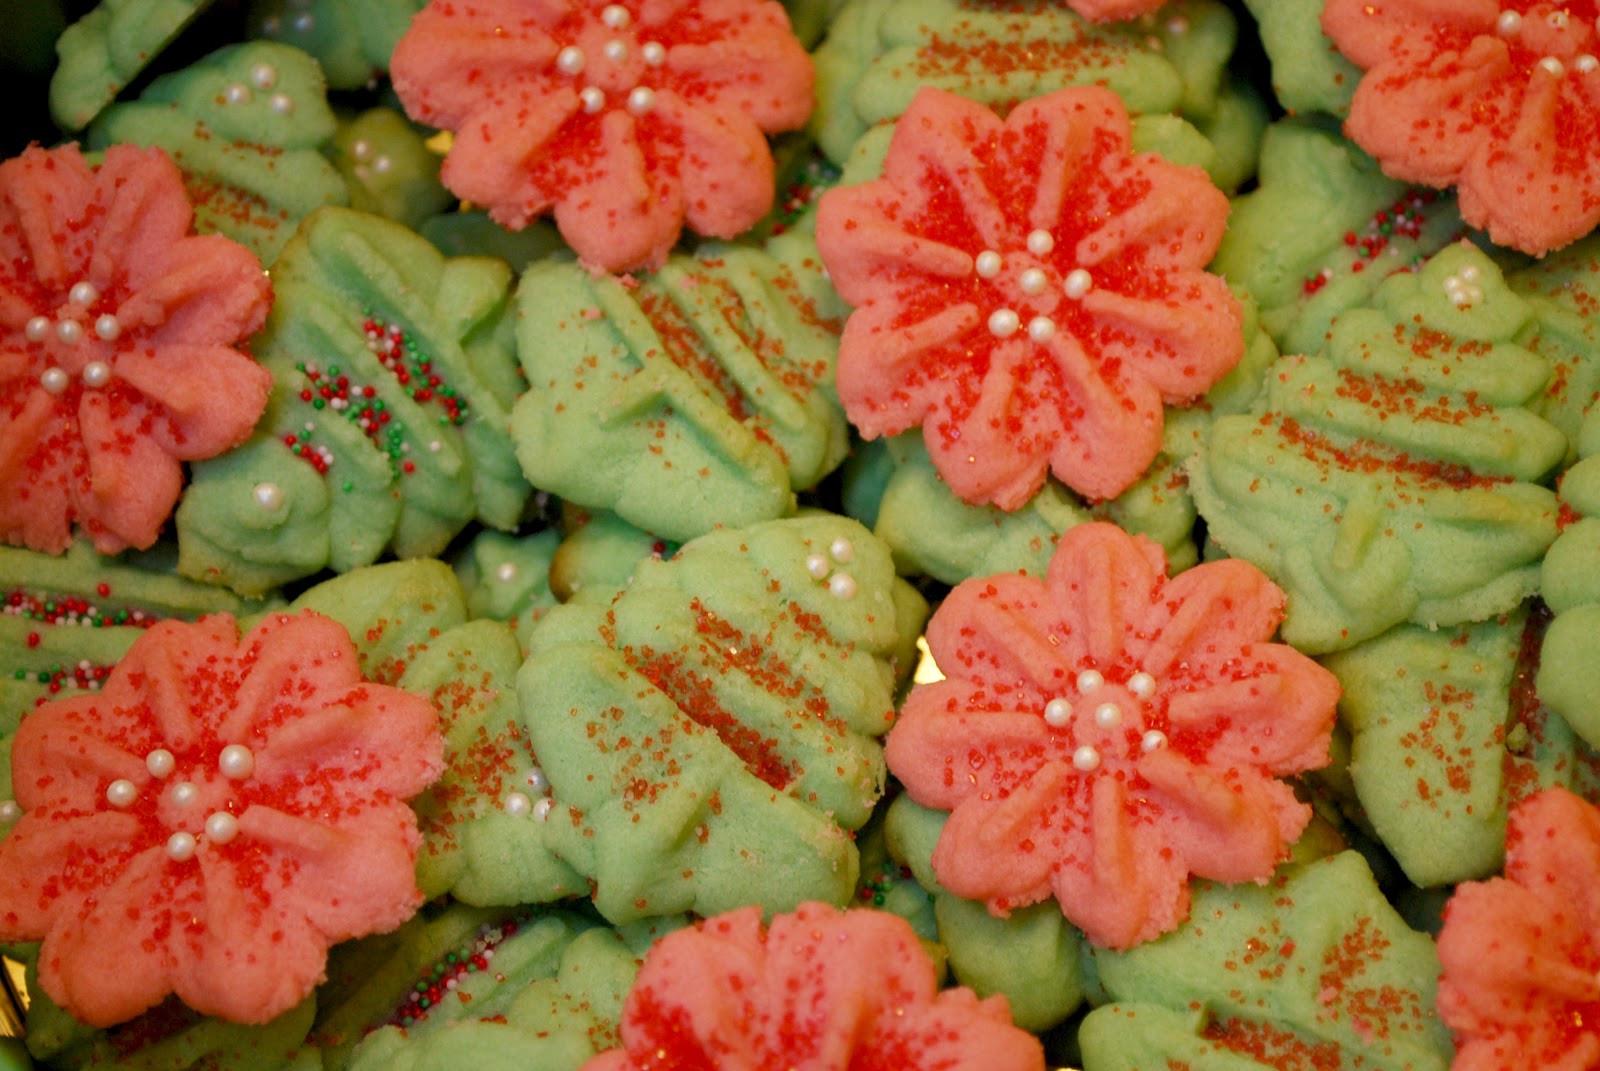 Christmas Almond Cookies  A Girl s Guilty Pleasures Vanilla Almond Sugar Christmas